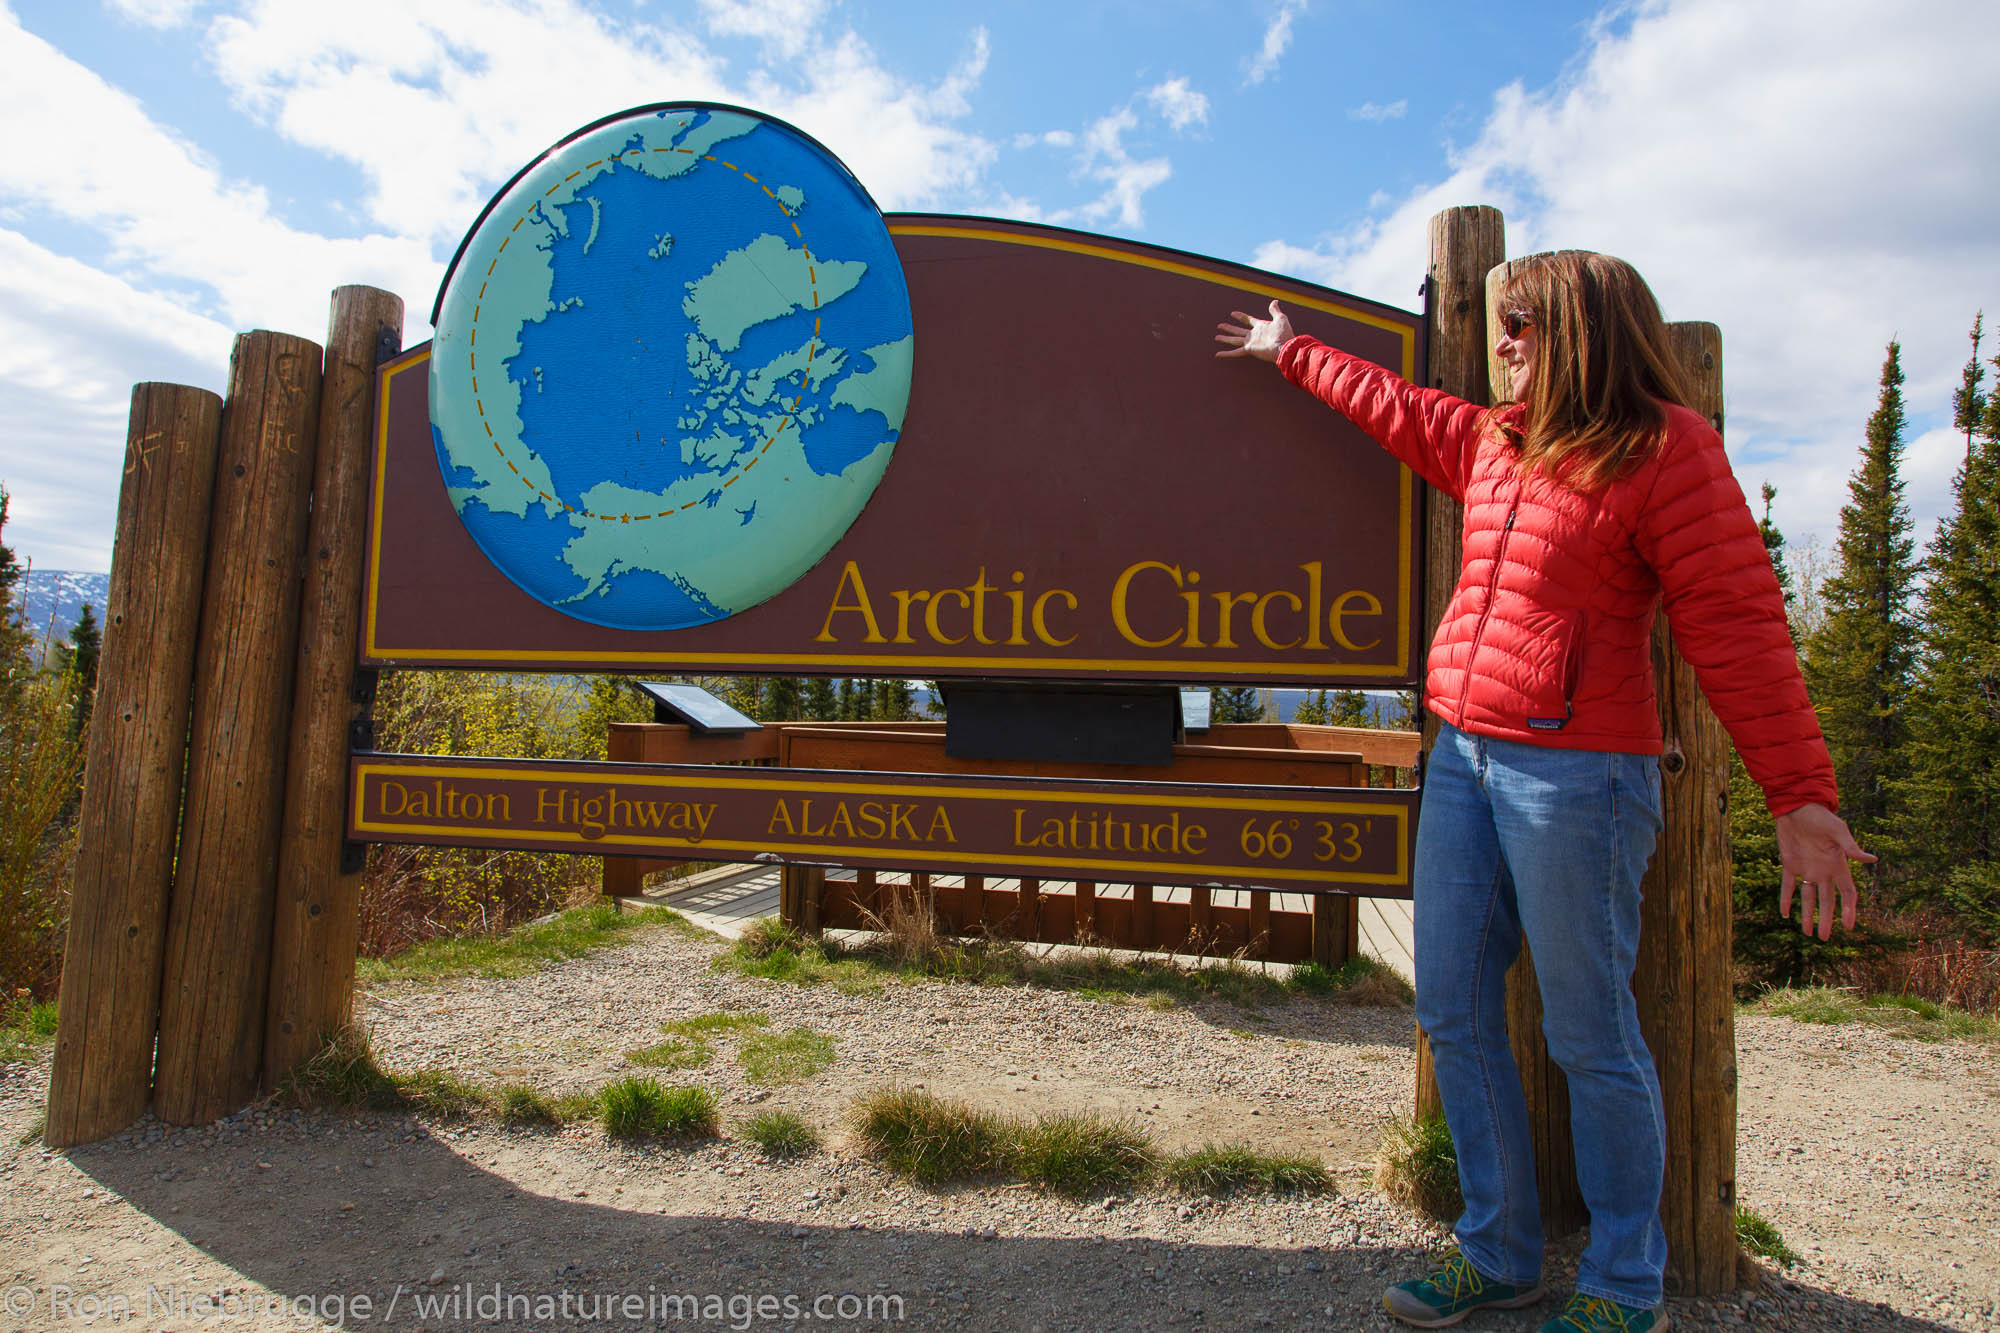 Visitors at the Arctic Circle along the Dalton Highway, Alaska. (model released)